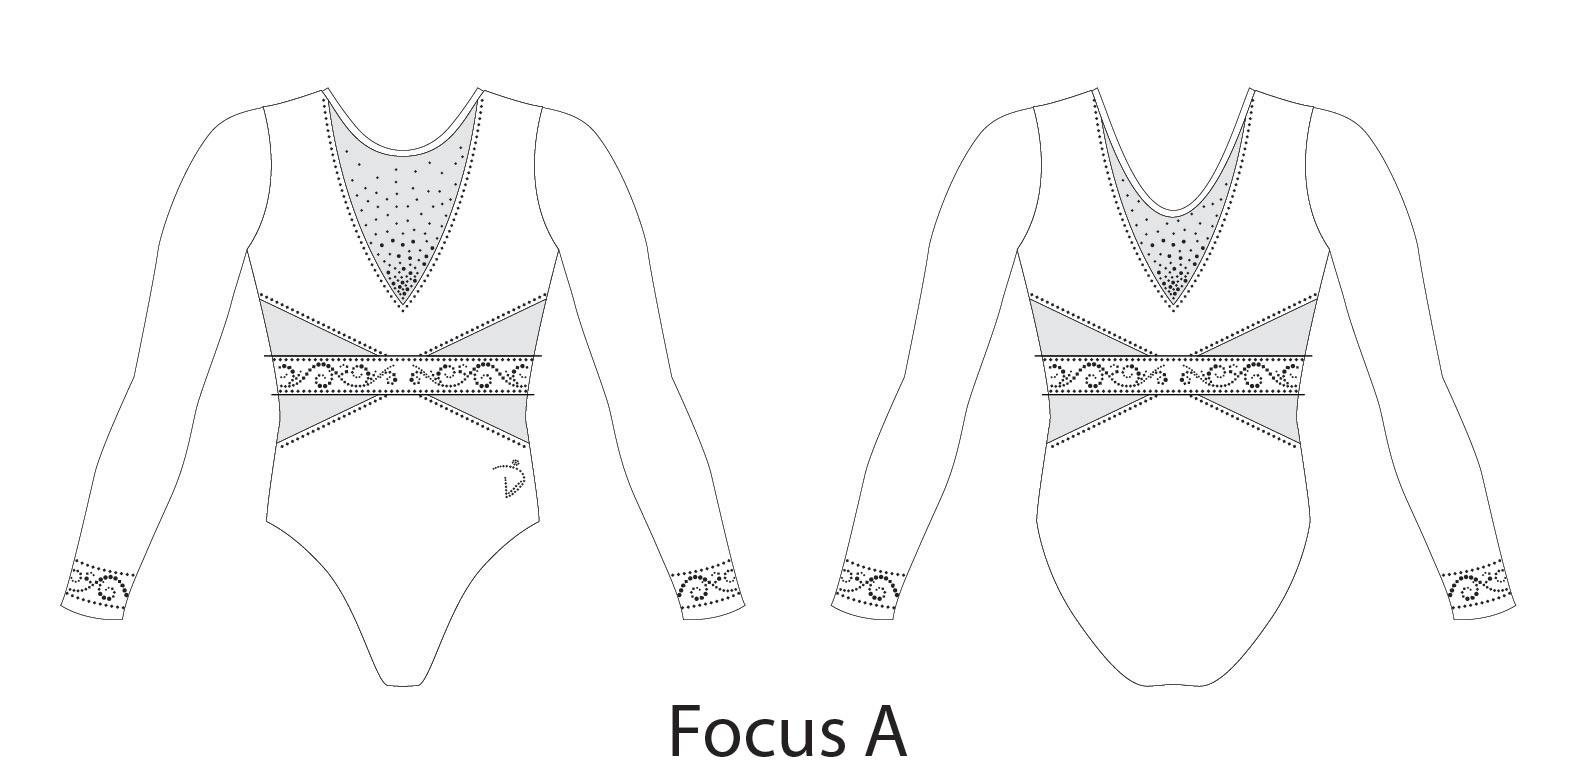 Focus A